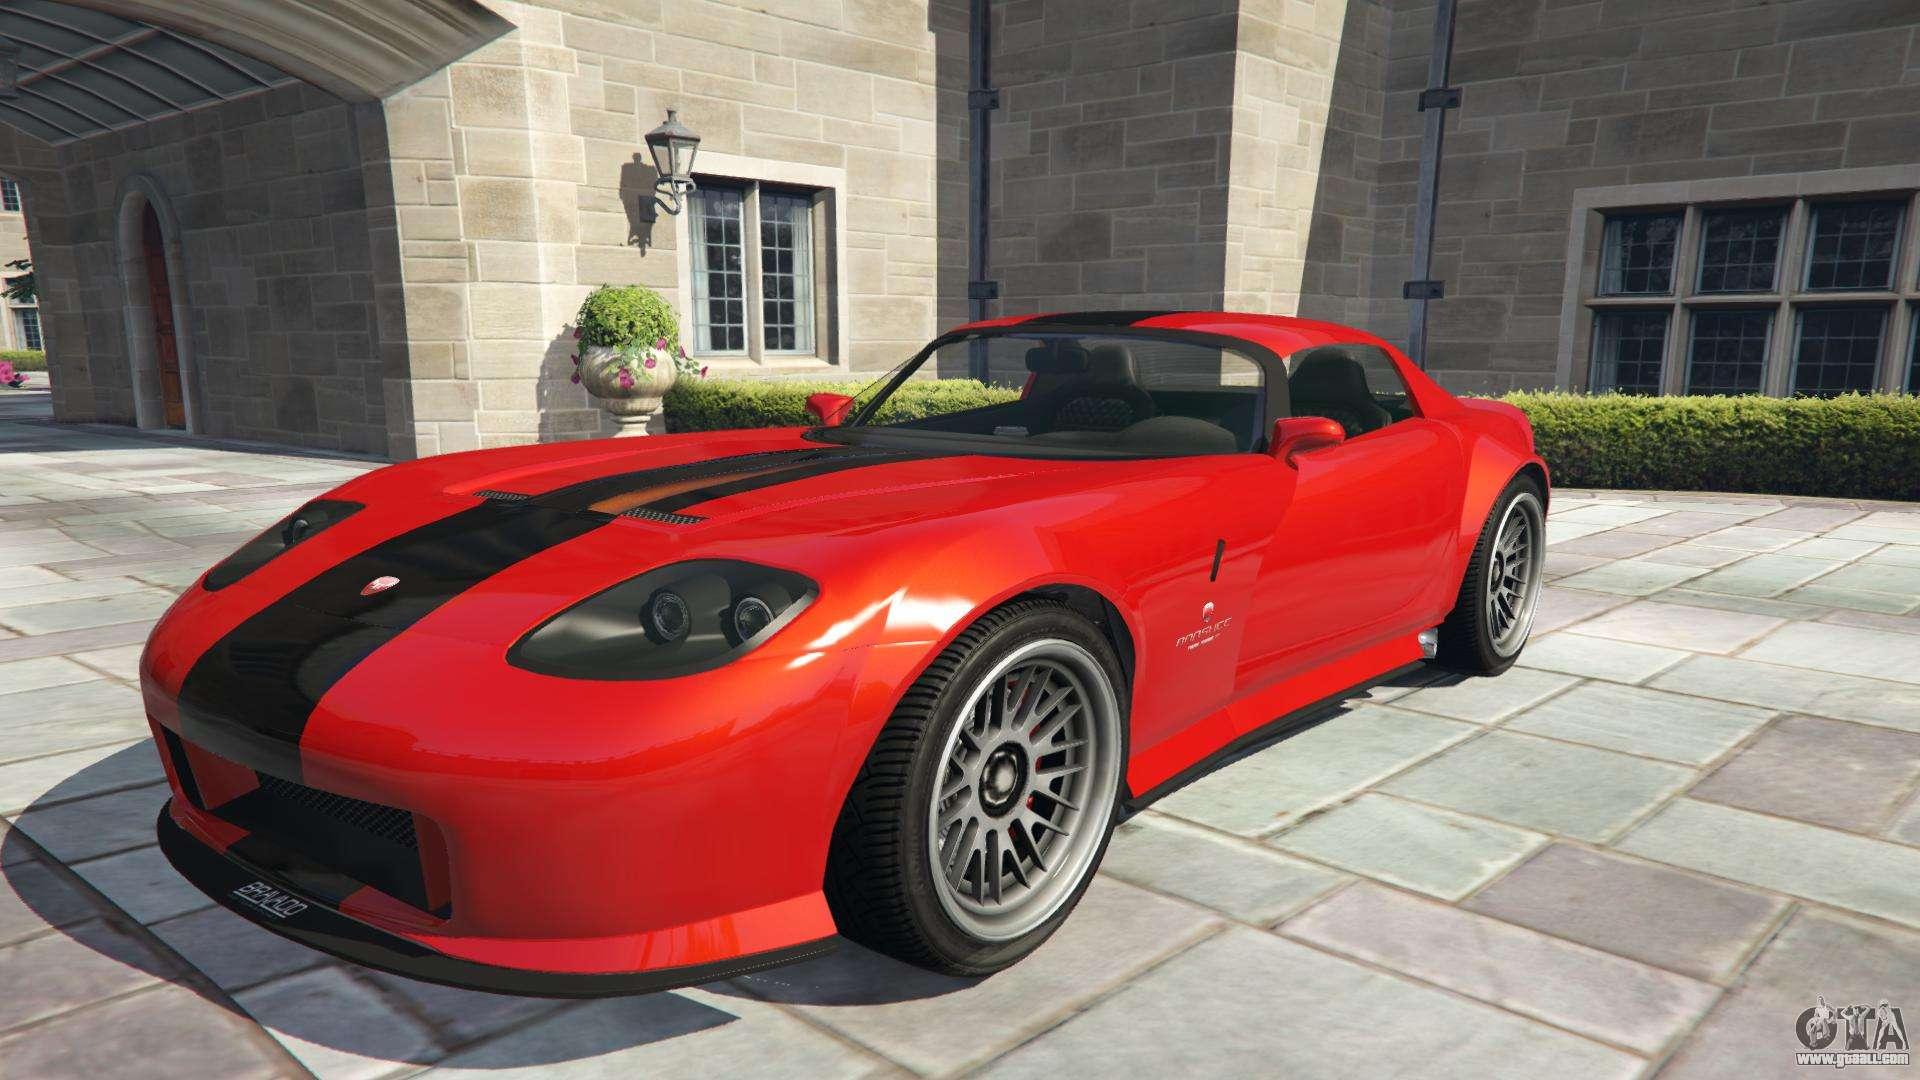 Bravado Banshee from GTA 5 - front view